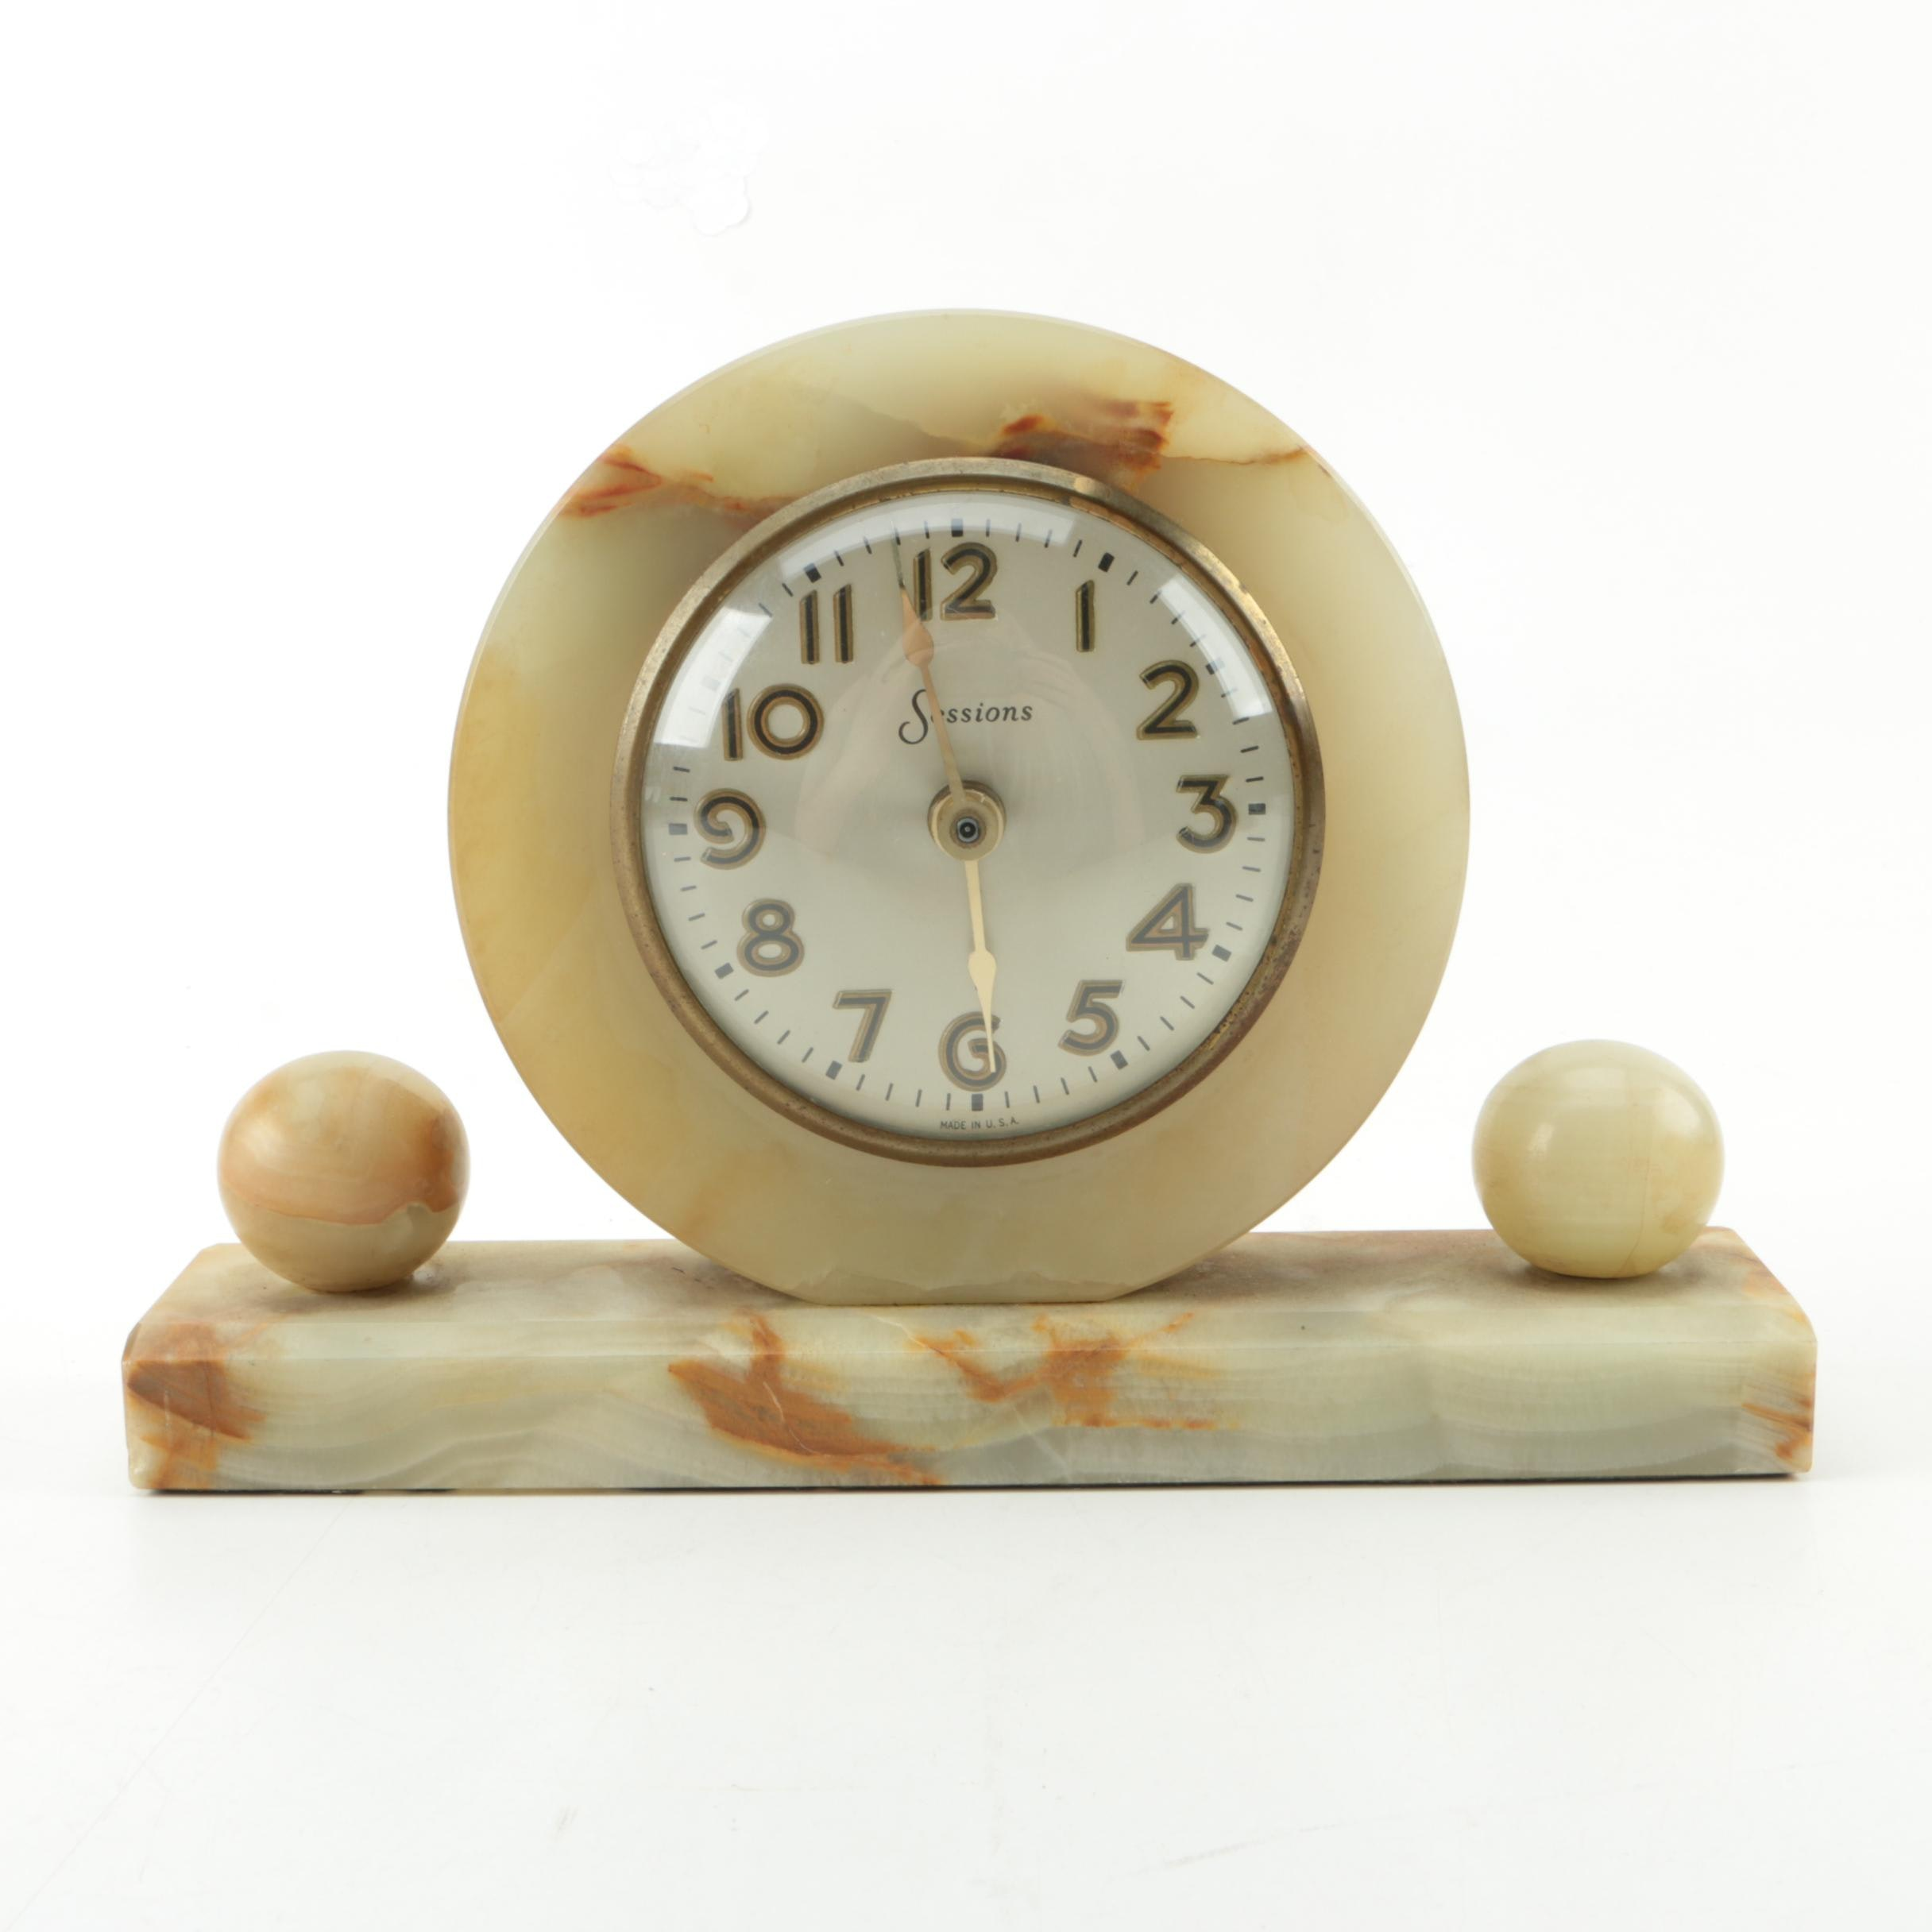 Sessions Art Deco Calcite Mantel Clock